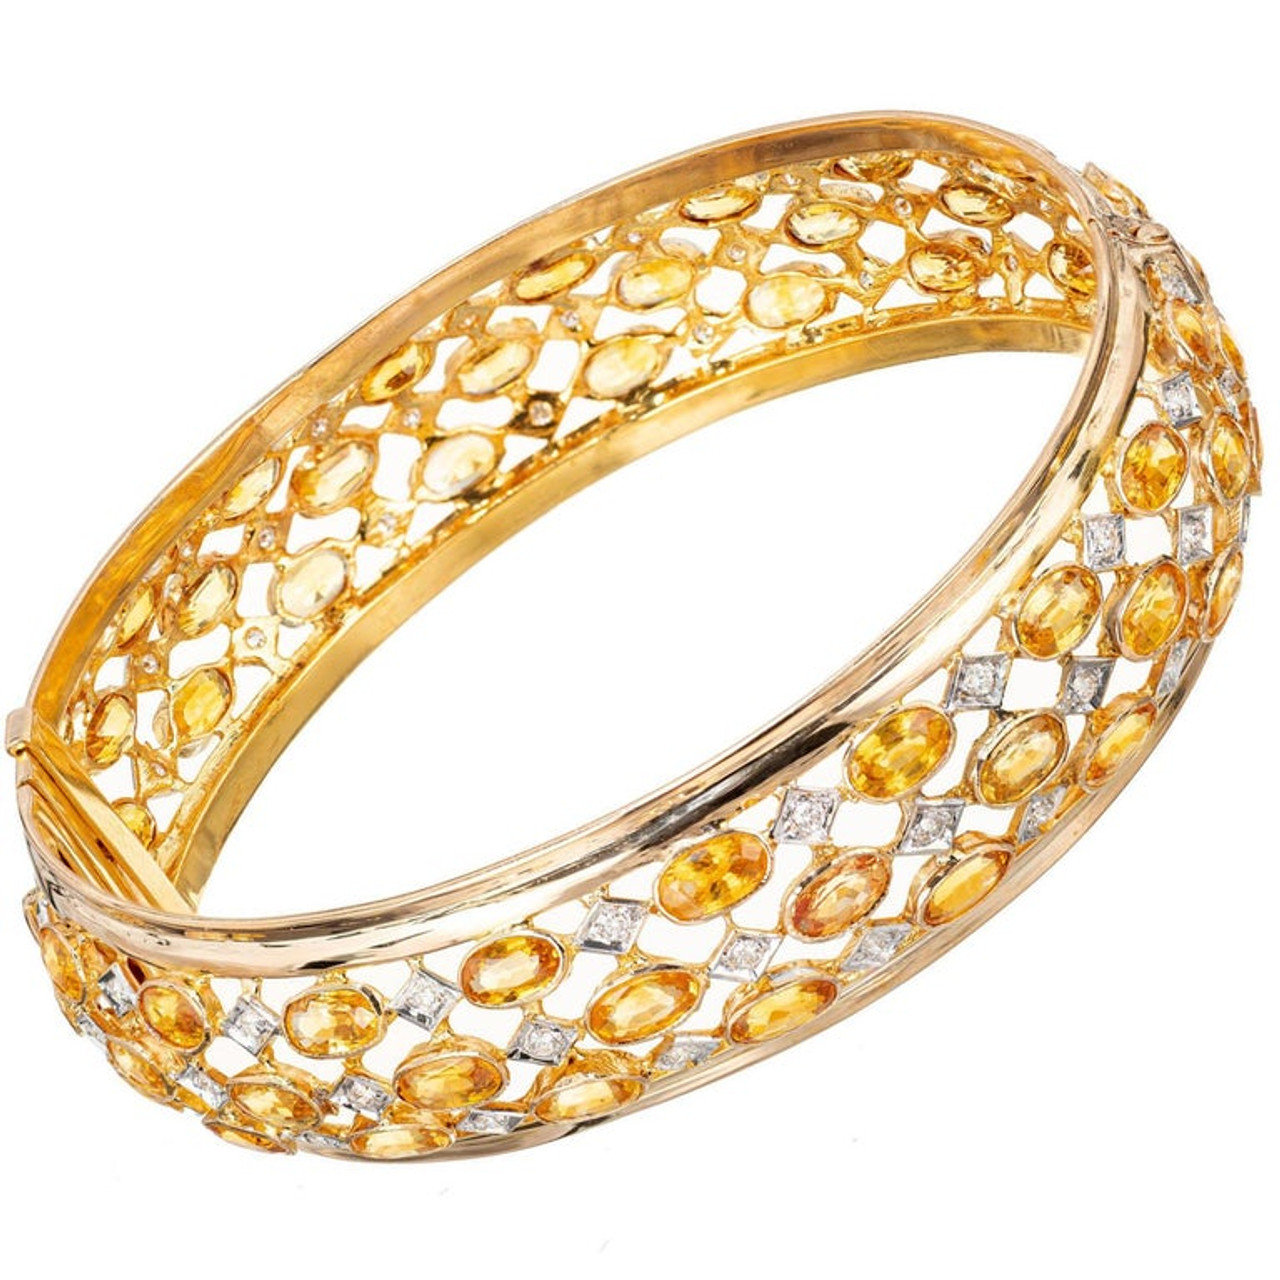 3 Ct 14K Yellow Gold Over 3 Row Sapphire /& Diamond Hinged Bangle Bracelet